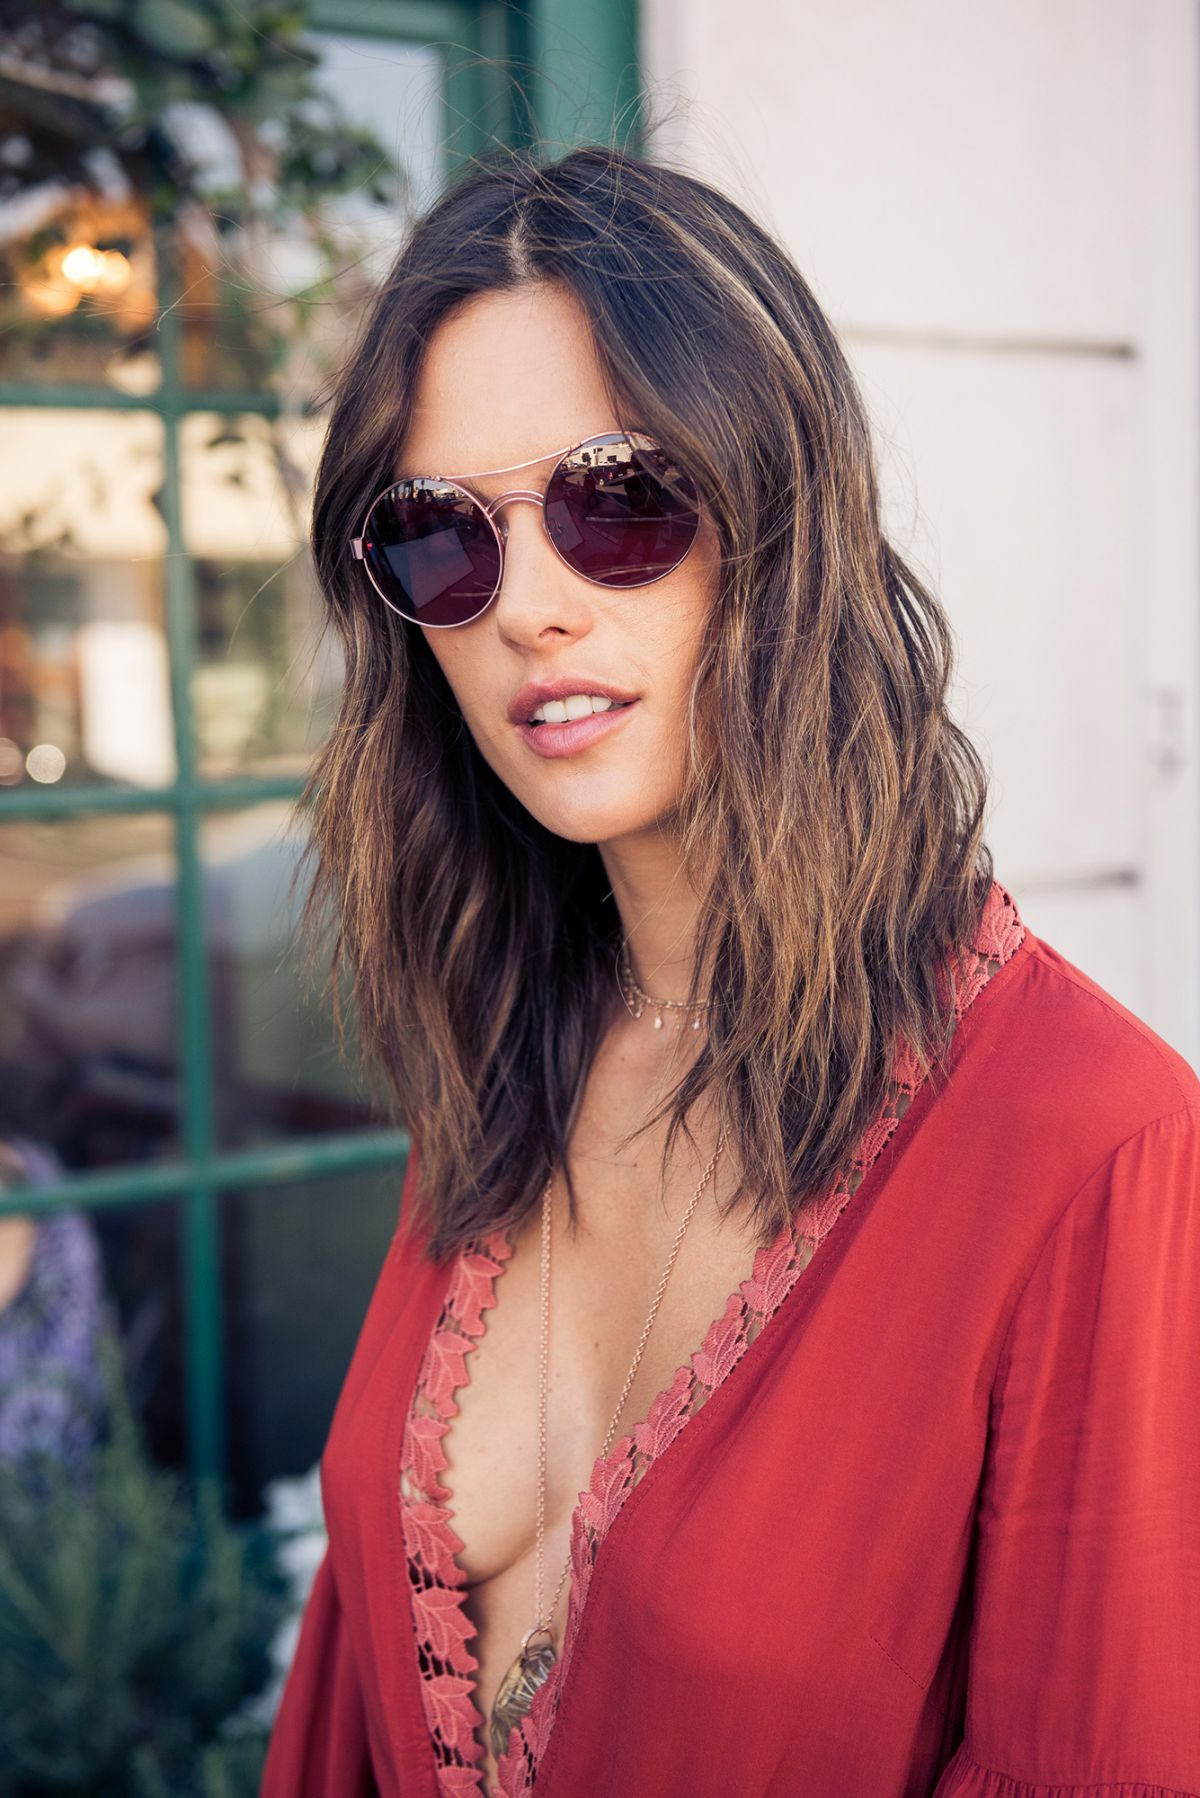 ALESSANDRA AMBROSIO for Guide to Los Angeles, November 2016 ... Alessandra Ambrosio